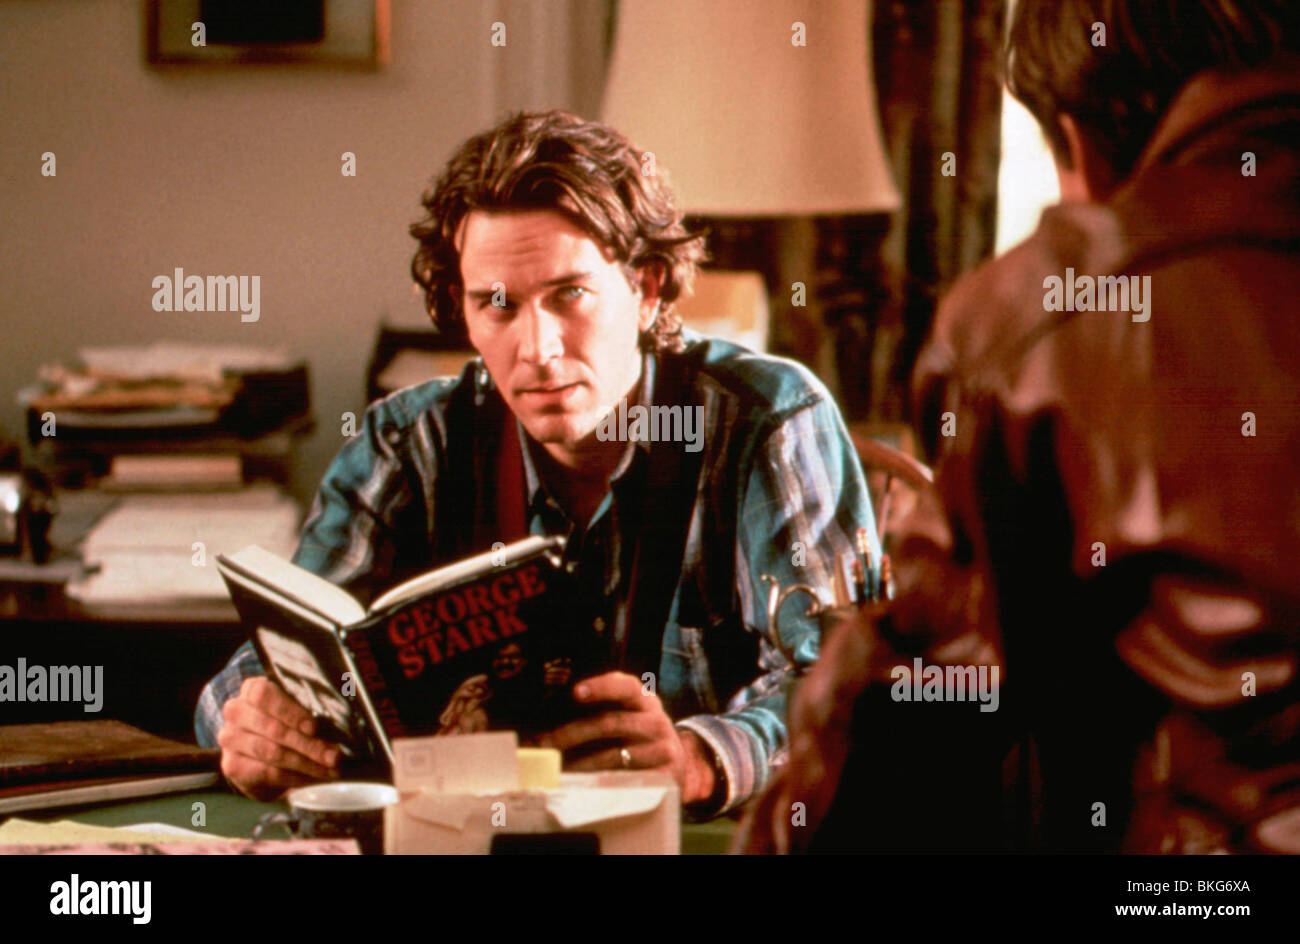 DIE DUNKLE HÄLFTE (1993) TIMOTHY HUTTON DRKH 023 Stockbild